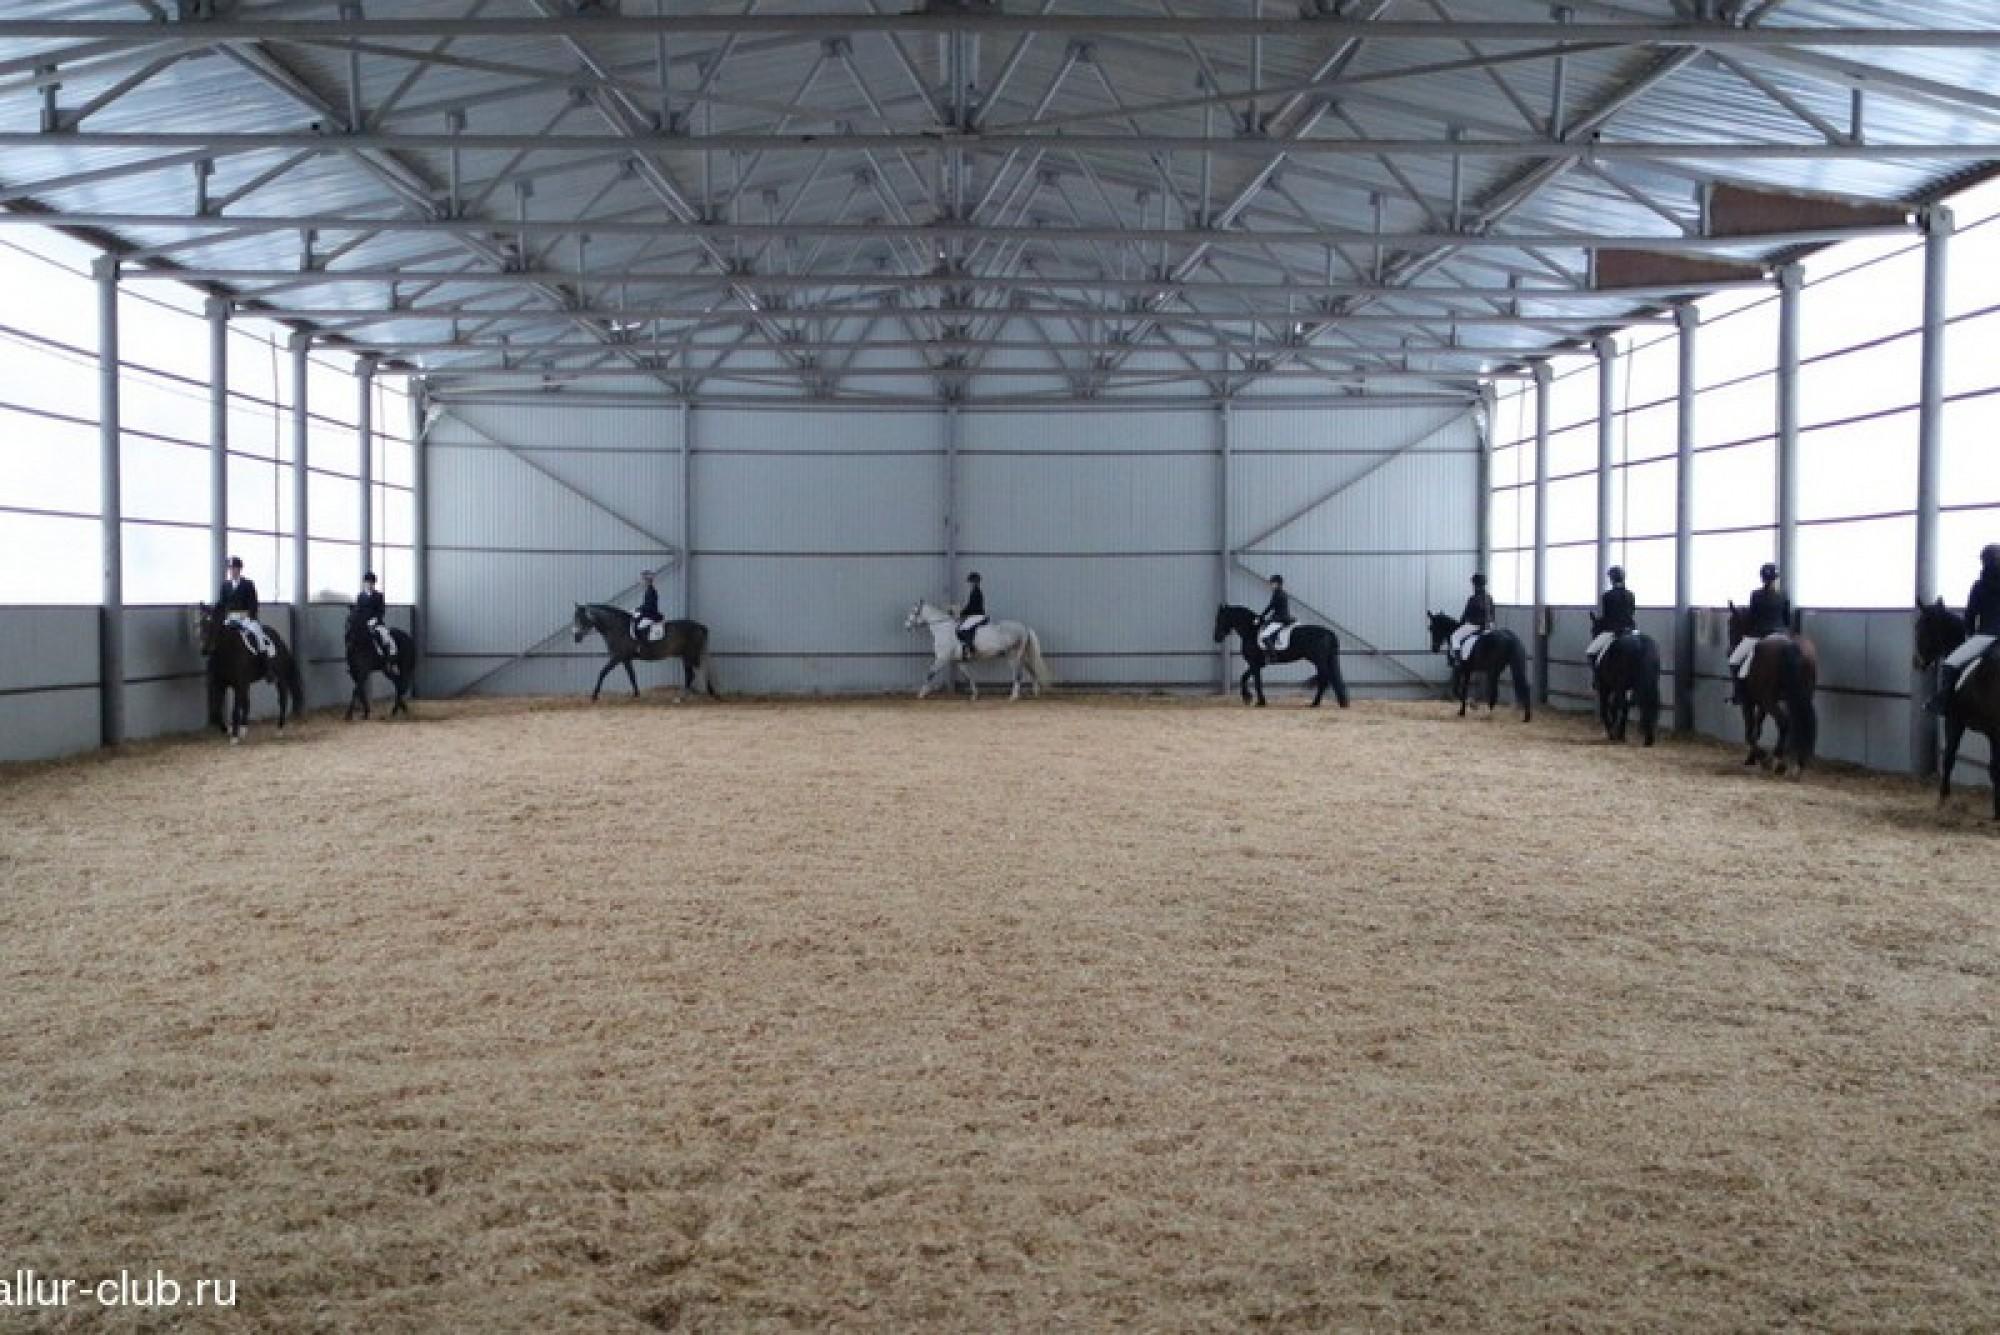 Prokoni.ru - самый популярный портал о конном спорте ...: http://www.prokoni.ru/news/155/tragediya_v_ksk__allyur__v_berdske.html